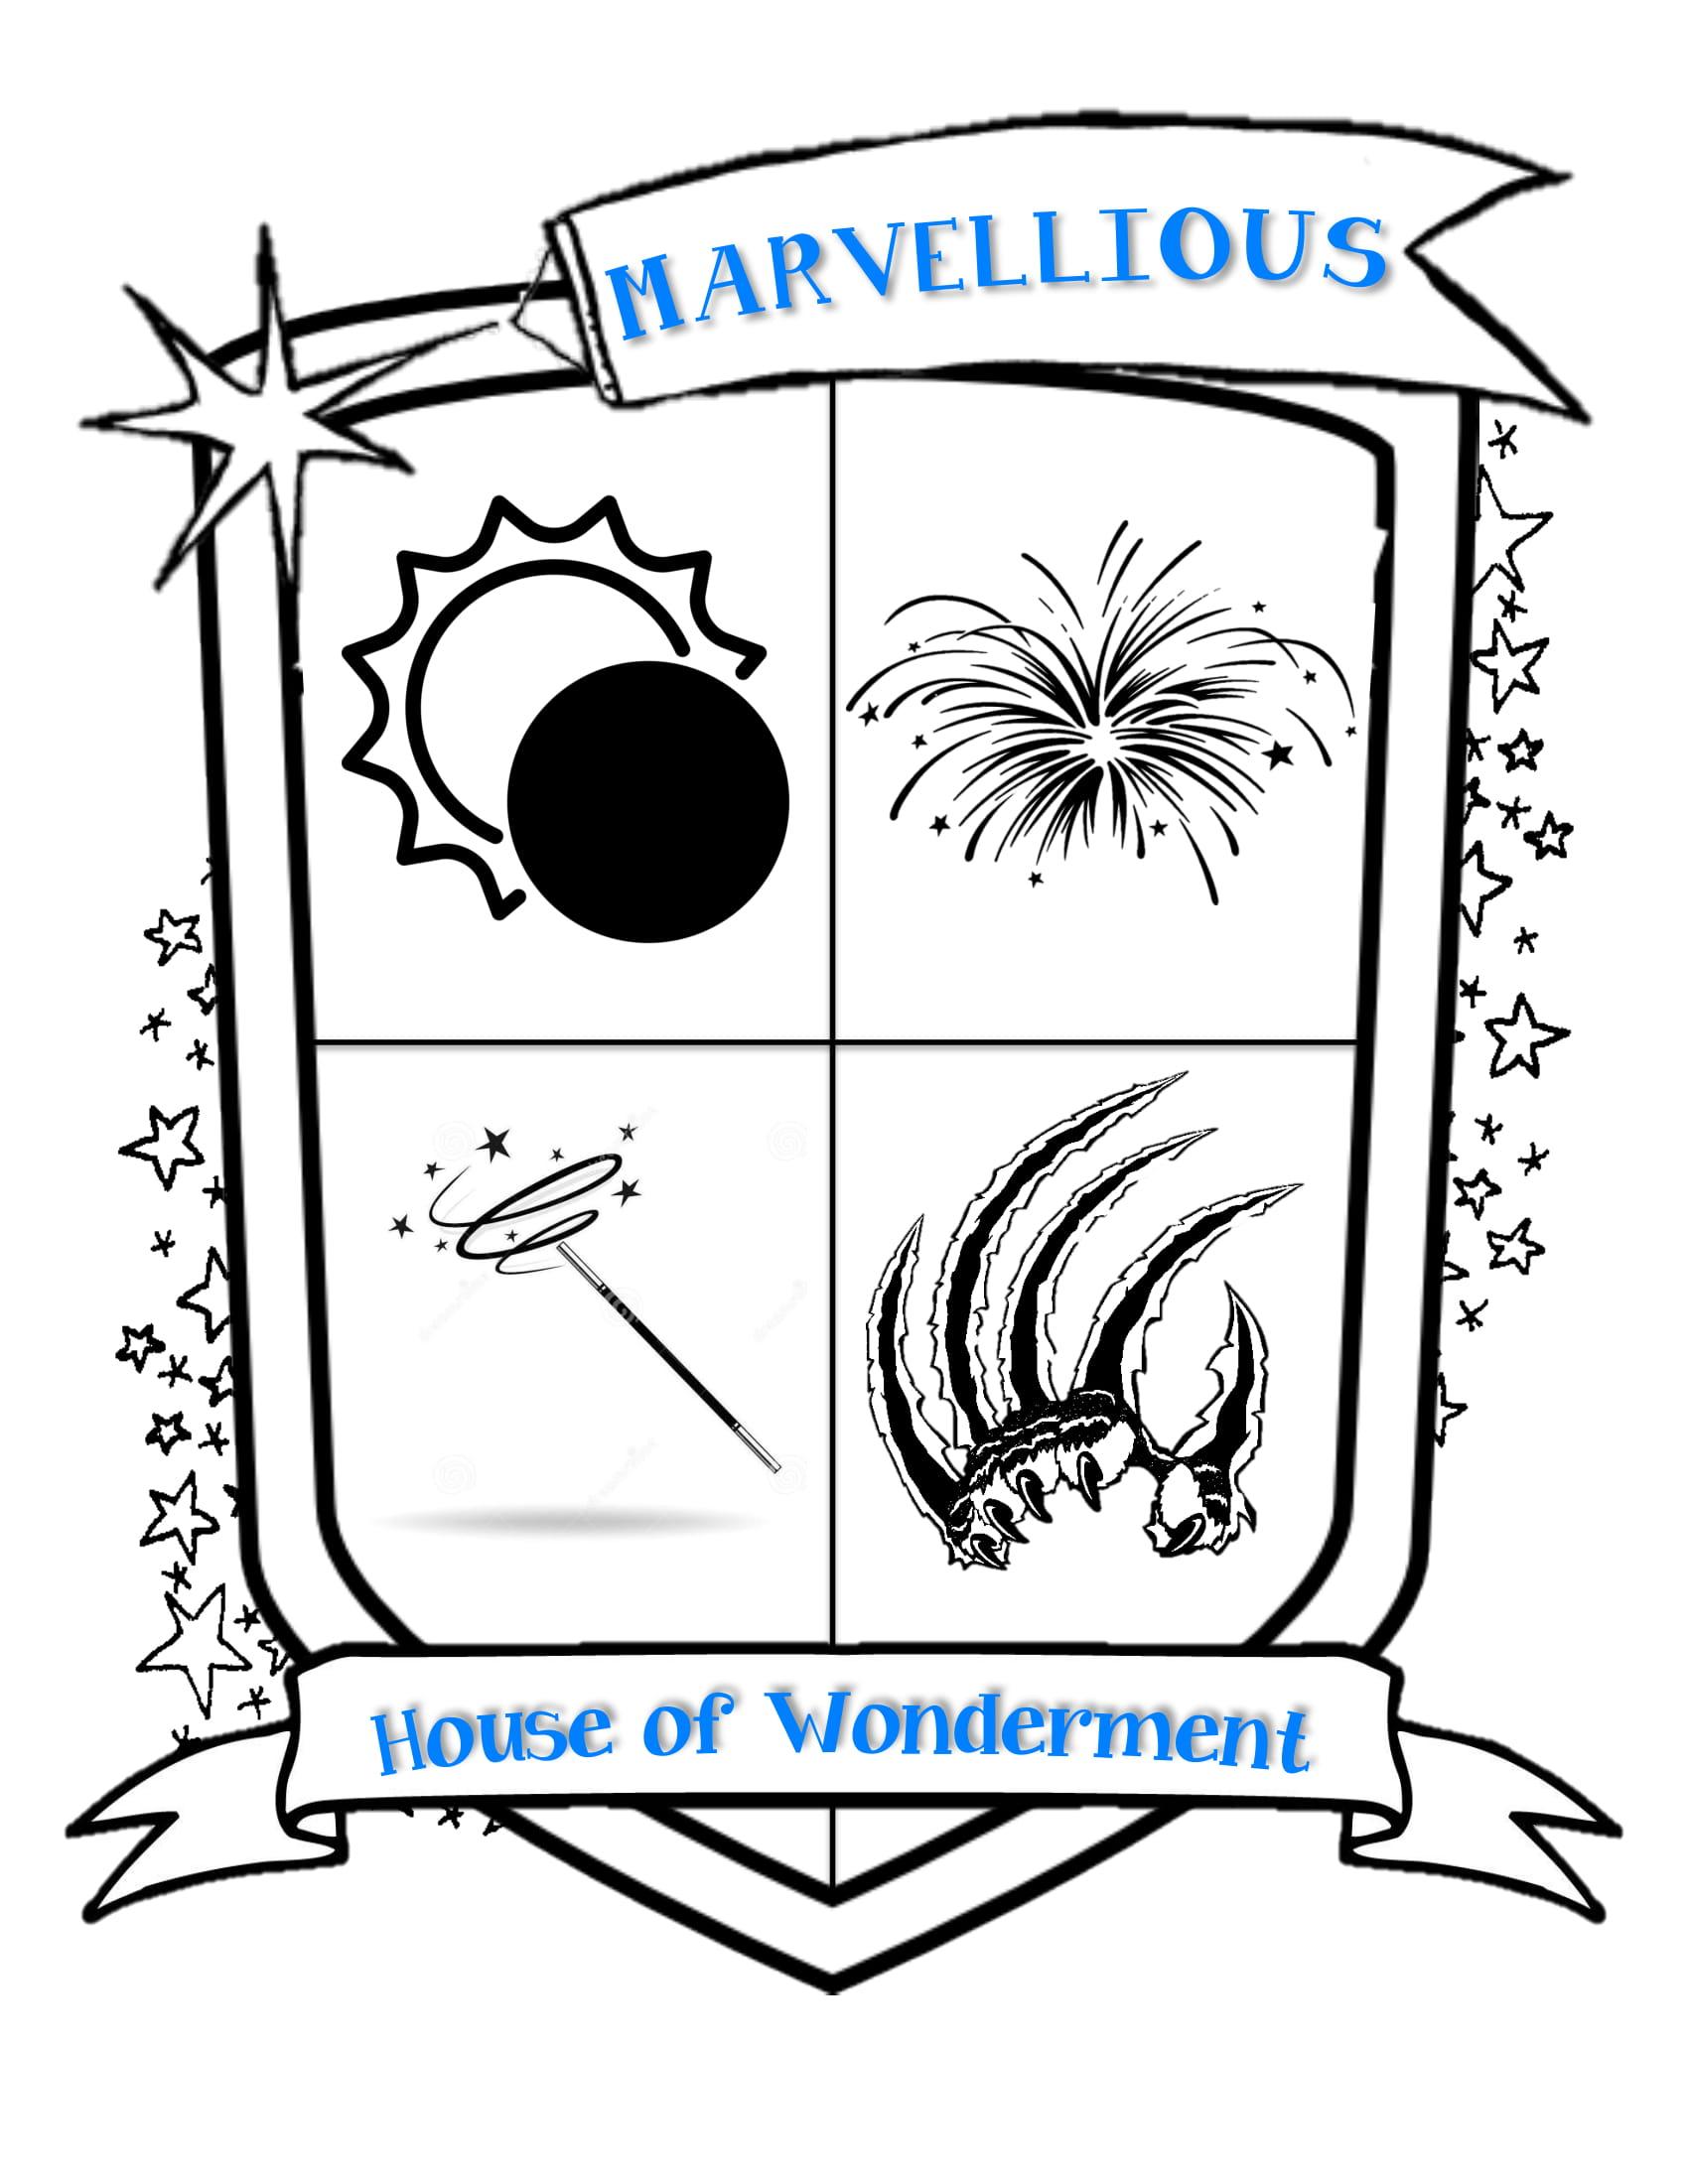 Marvellious crest